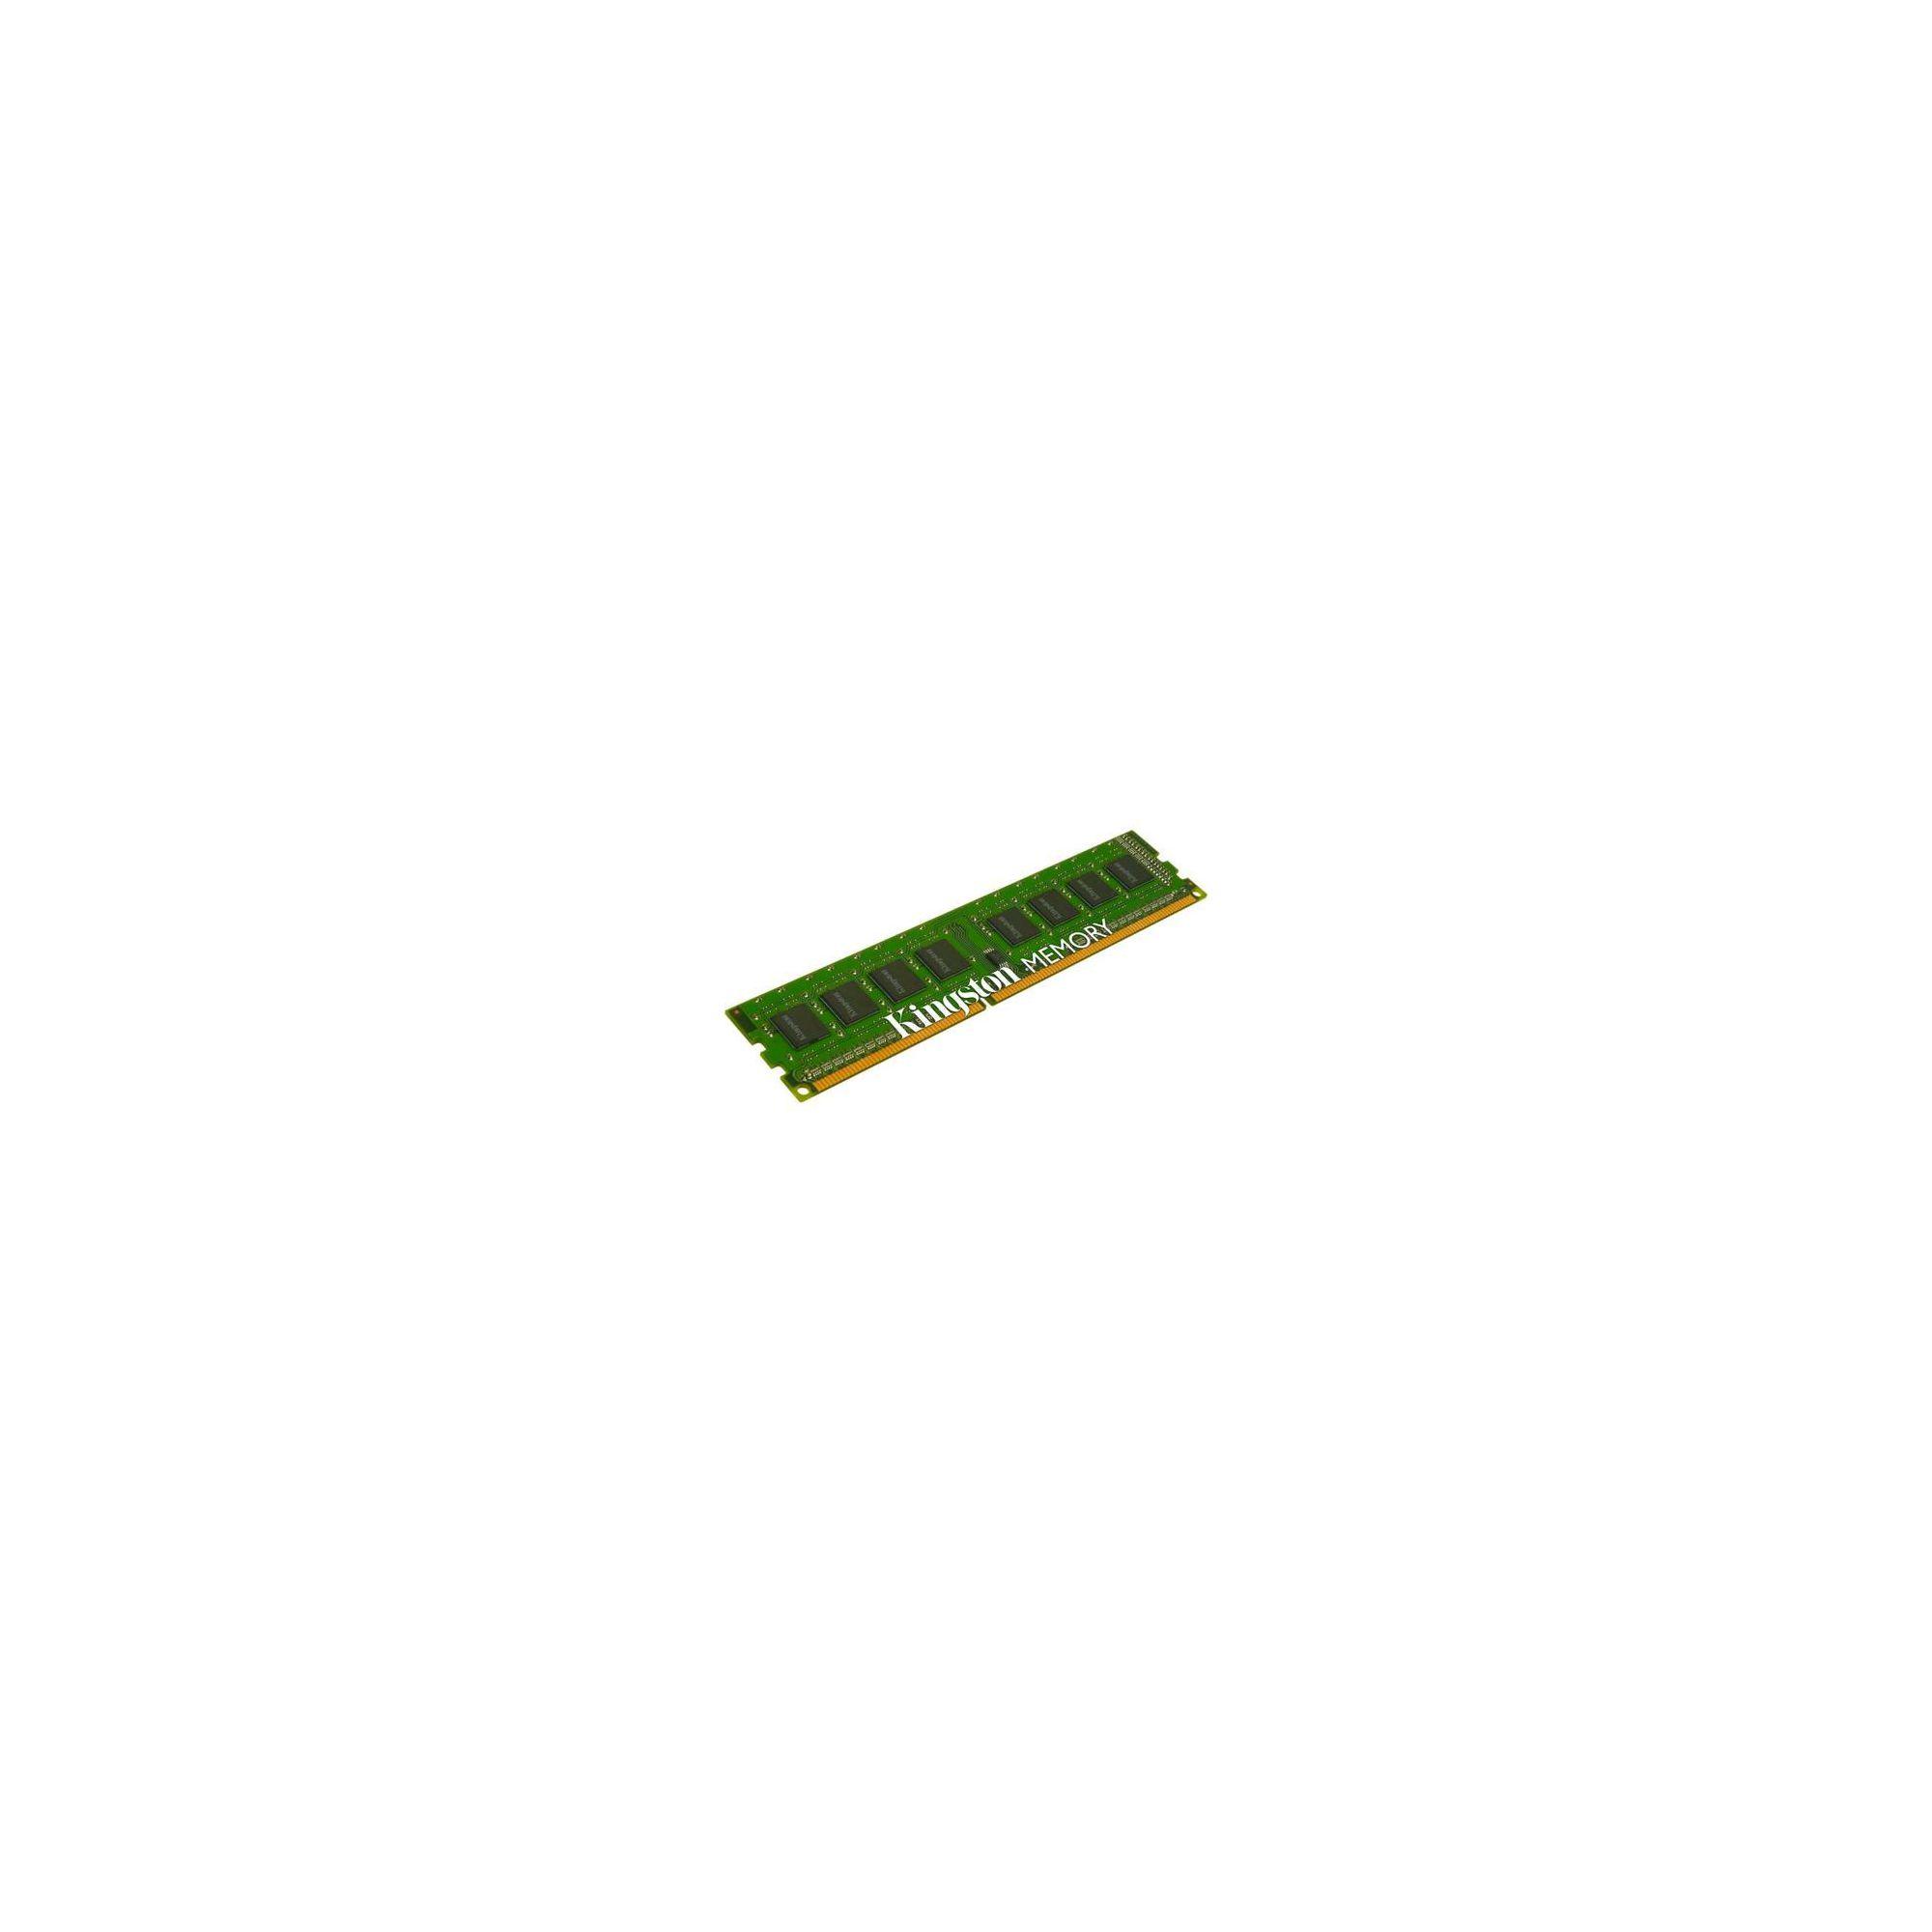 Kingston KTD-PE310Q 16GB (1 x 16GB) Memory Module 1066MHz at Tescos Direct